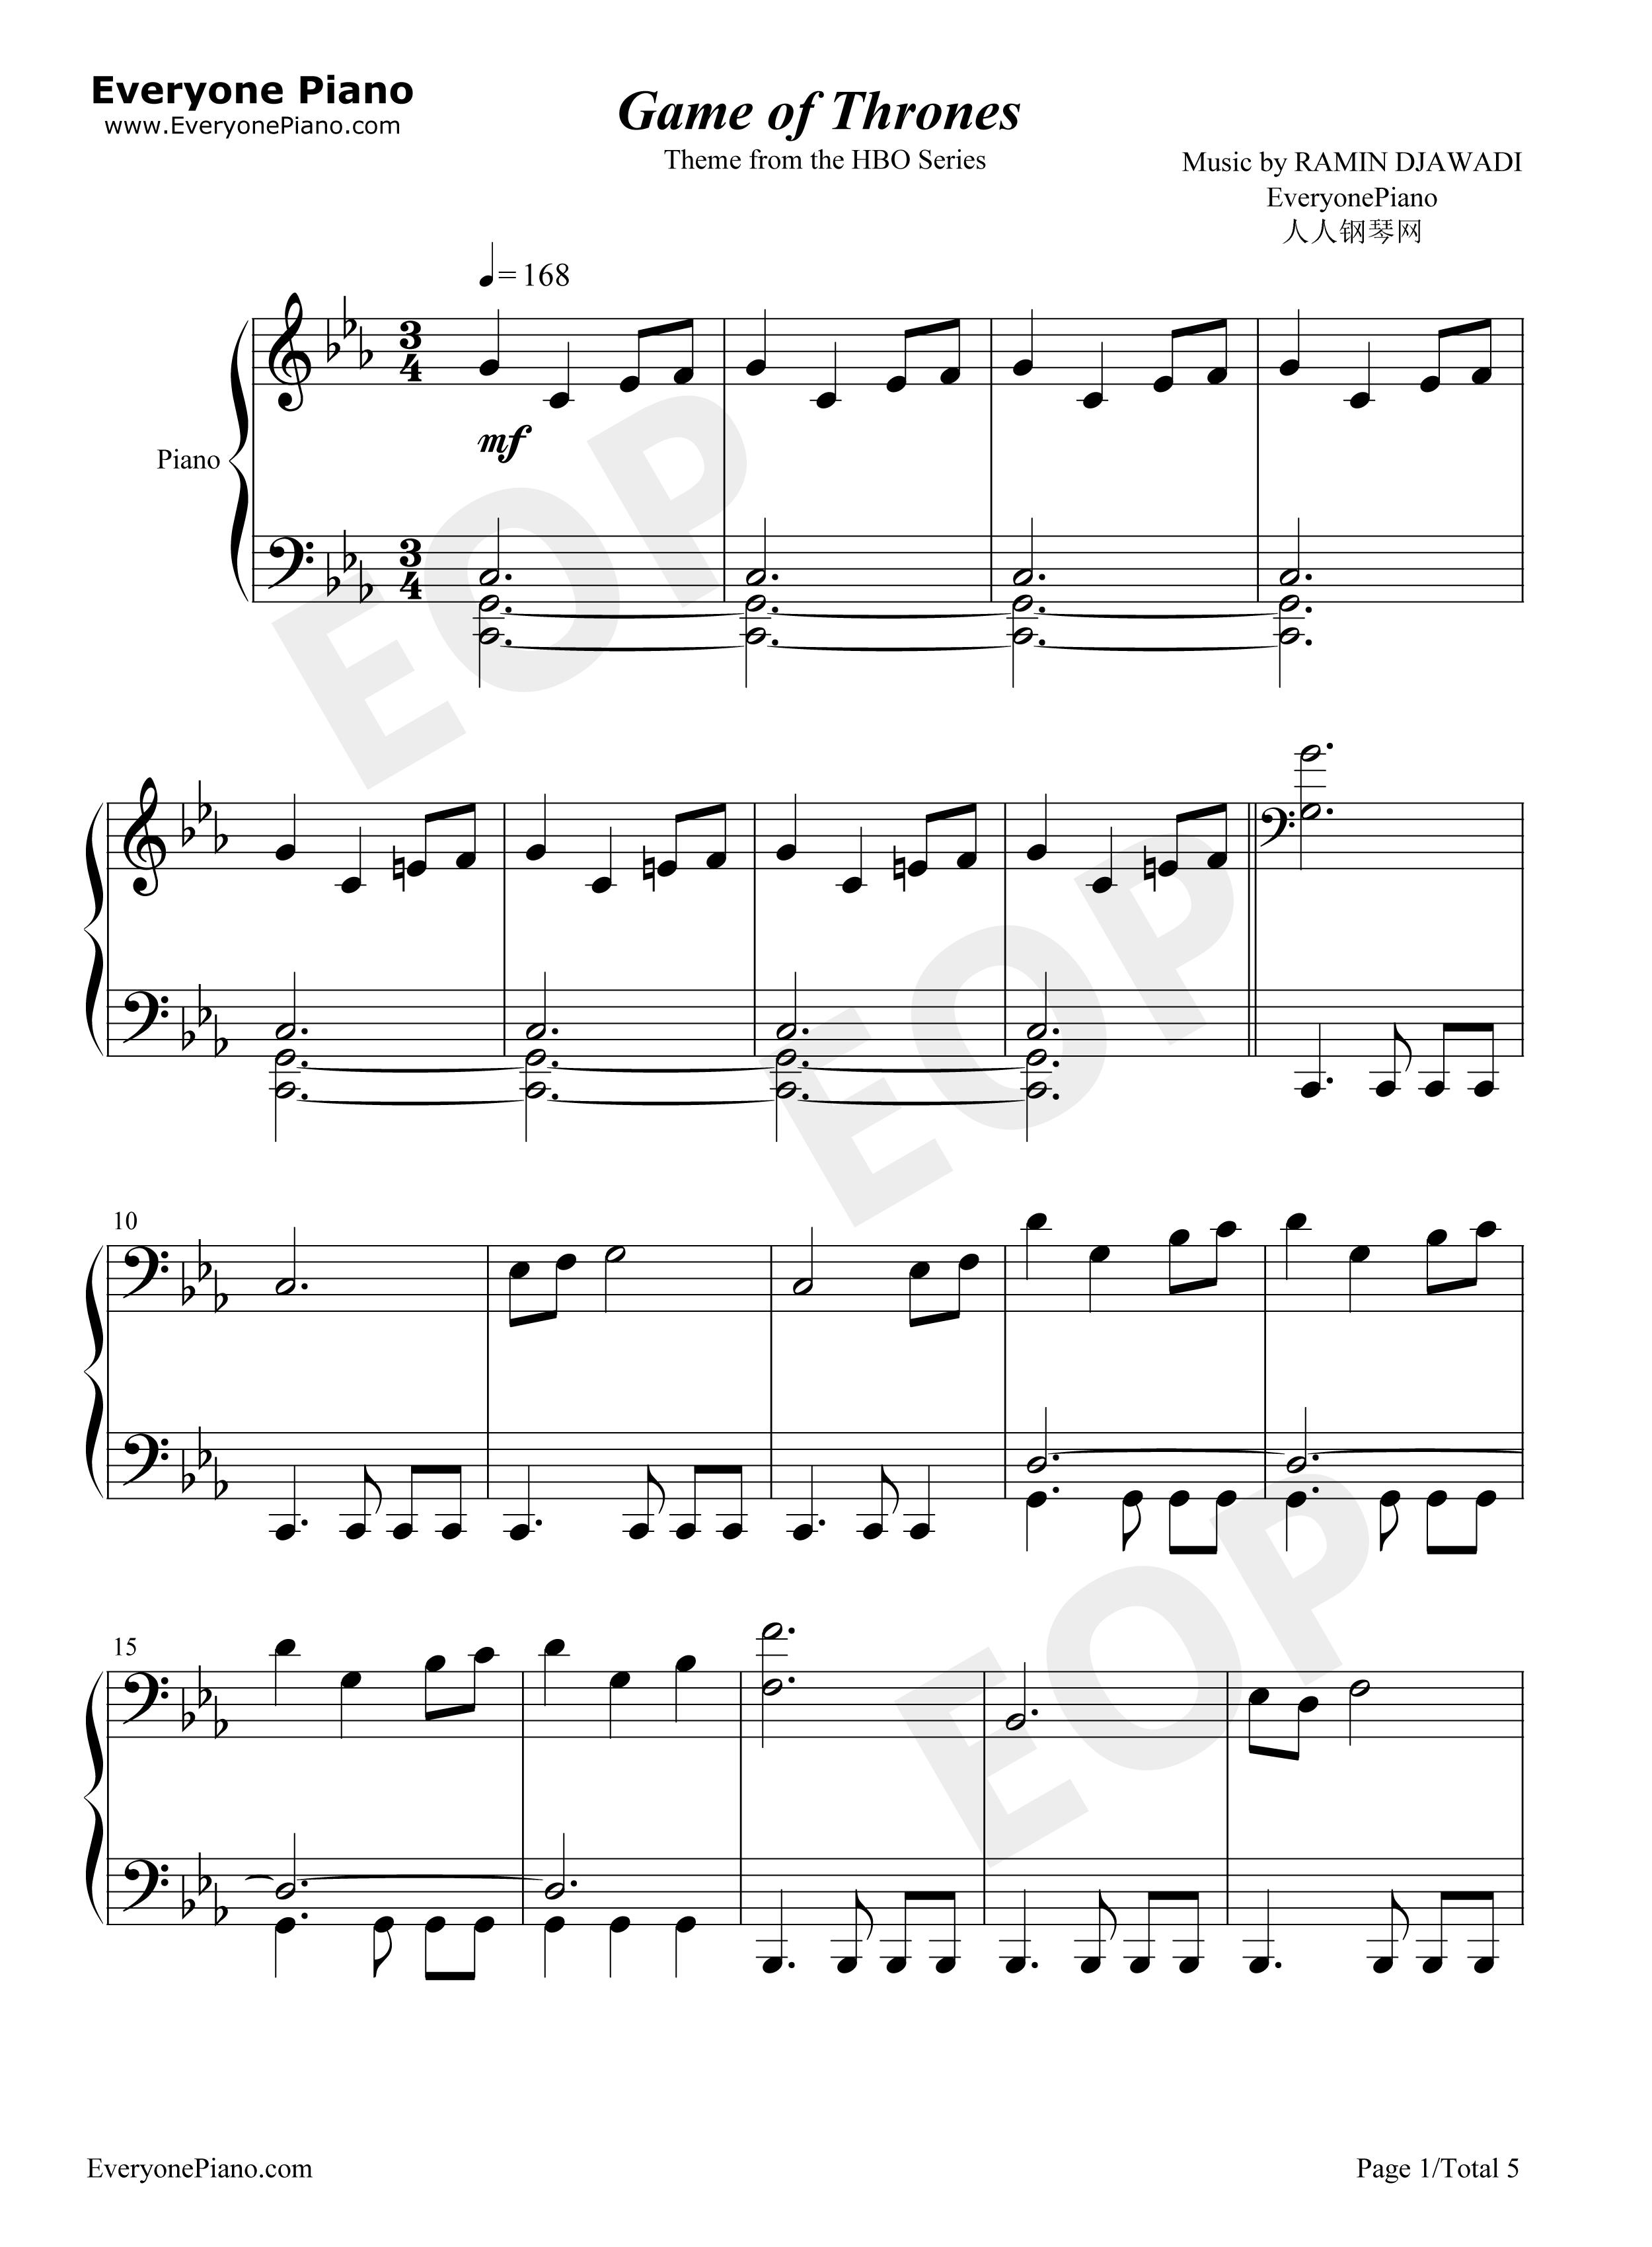 Game of thrones piano sheet music kyle landry